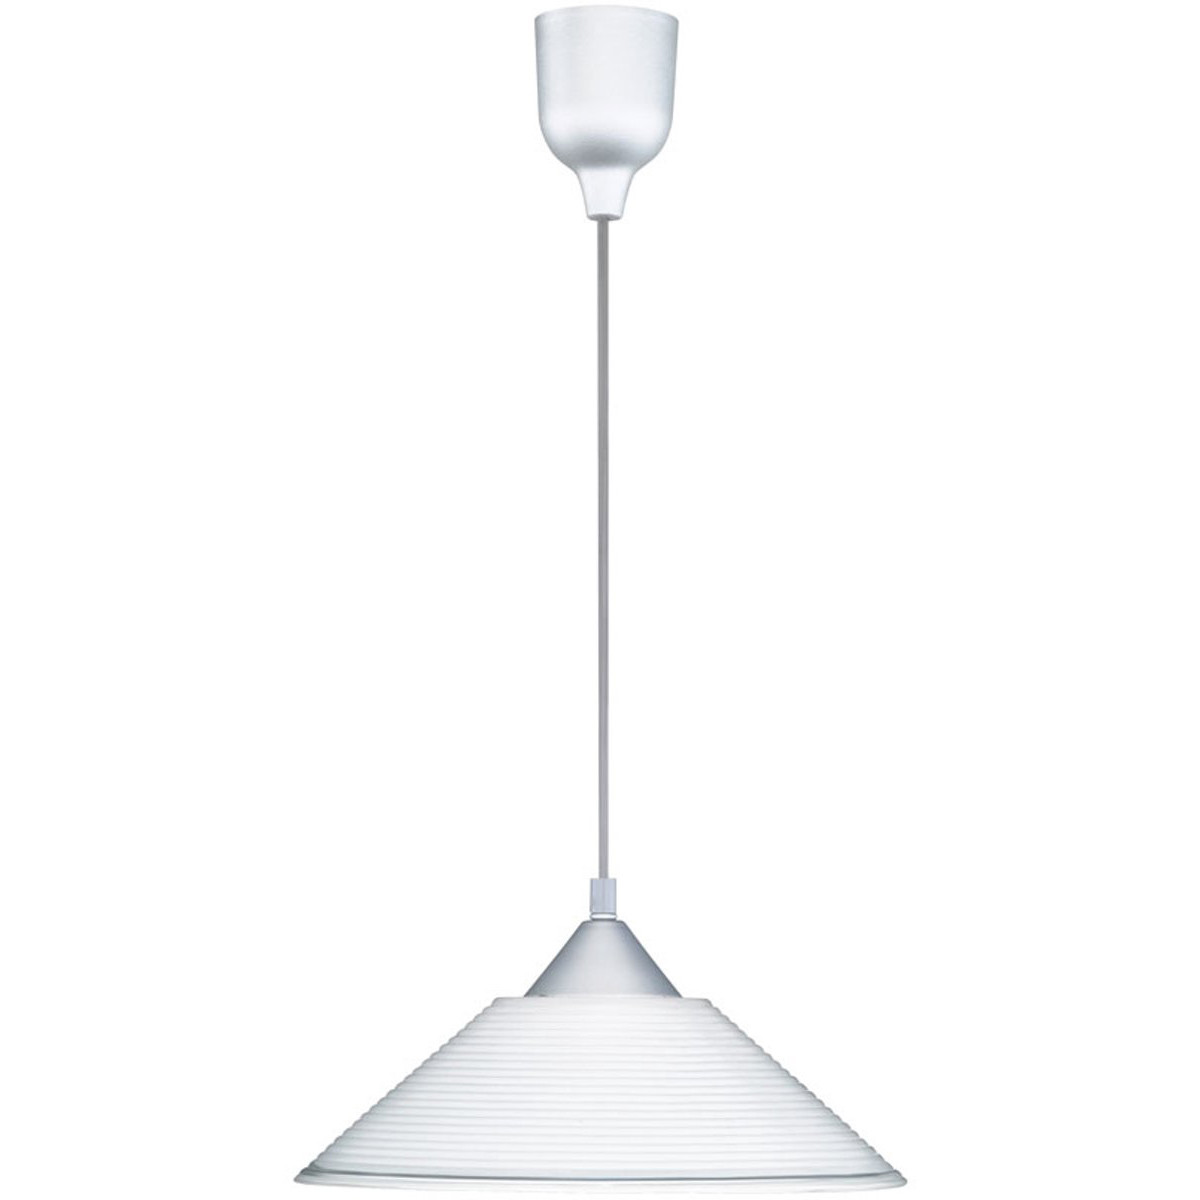 LED Hanglamp - Hangverlichting - Trion Dikon - E27 Fitting - Rond - Aluminium Wit - Kunststof